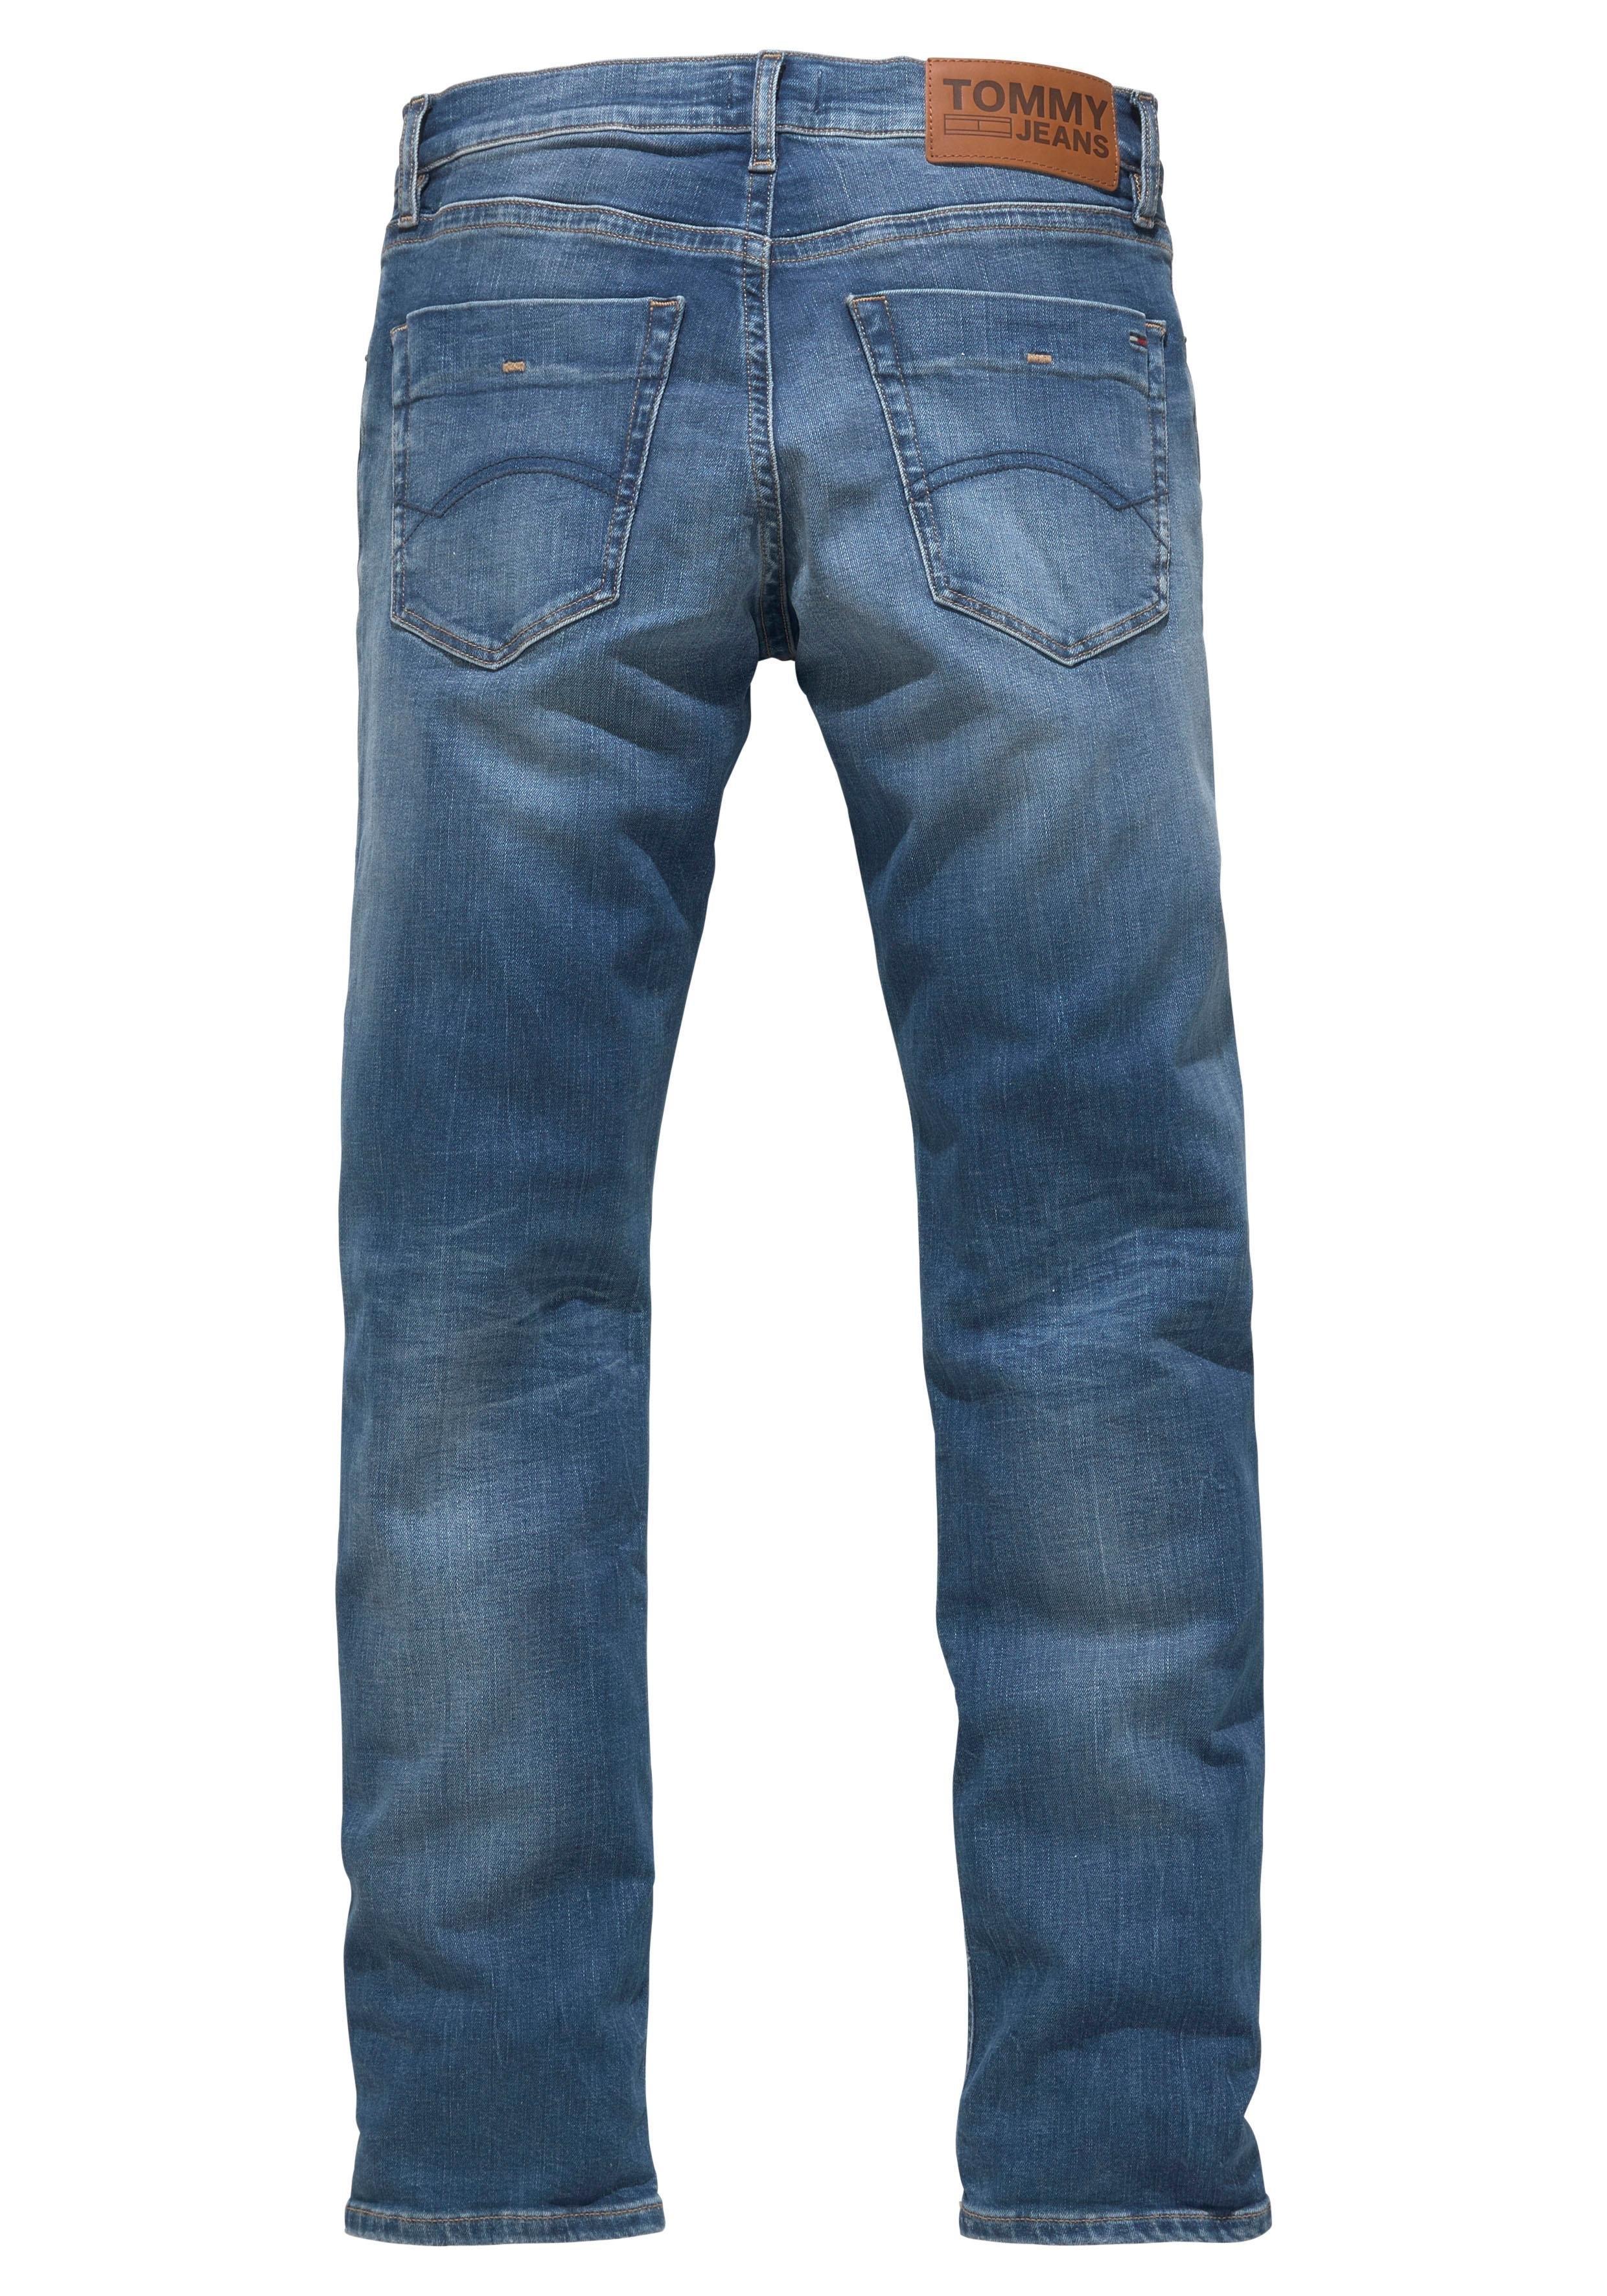 Jeansslim Online Slim Jeans Scanton Tommy Fit Dymmb Nu Kopen CBrdxoeW